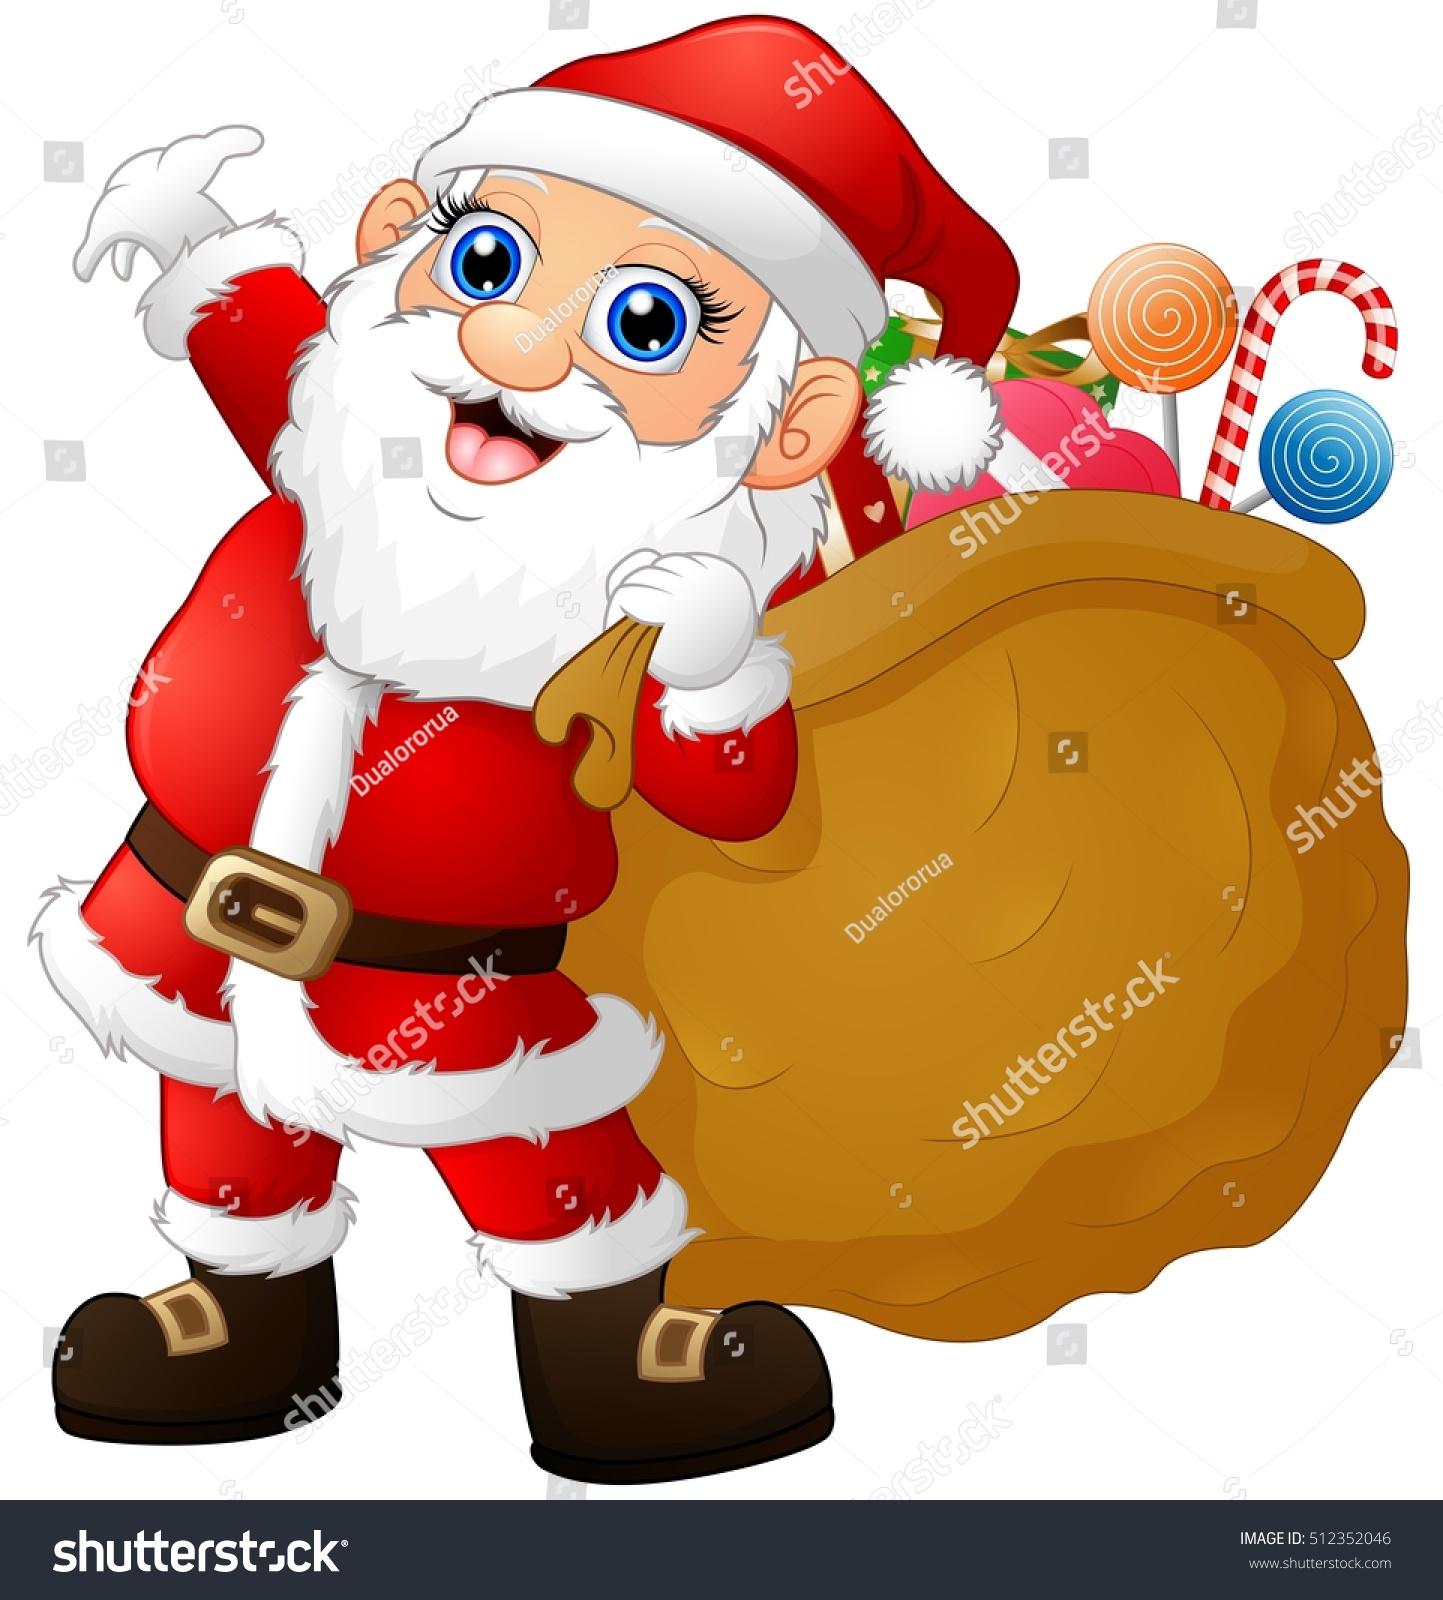 Santa claus carrying sack full gifts stock illustration